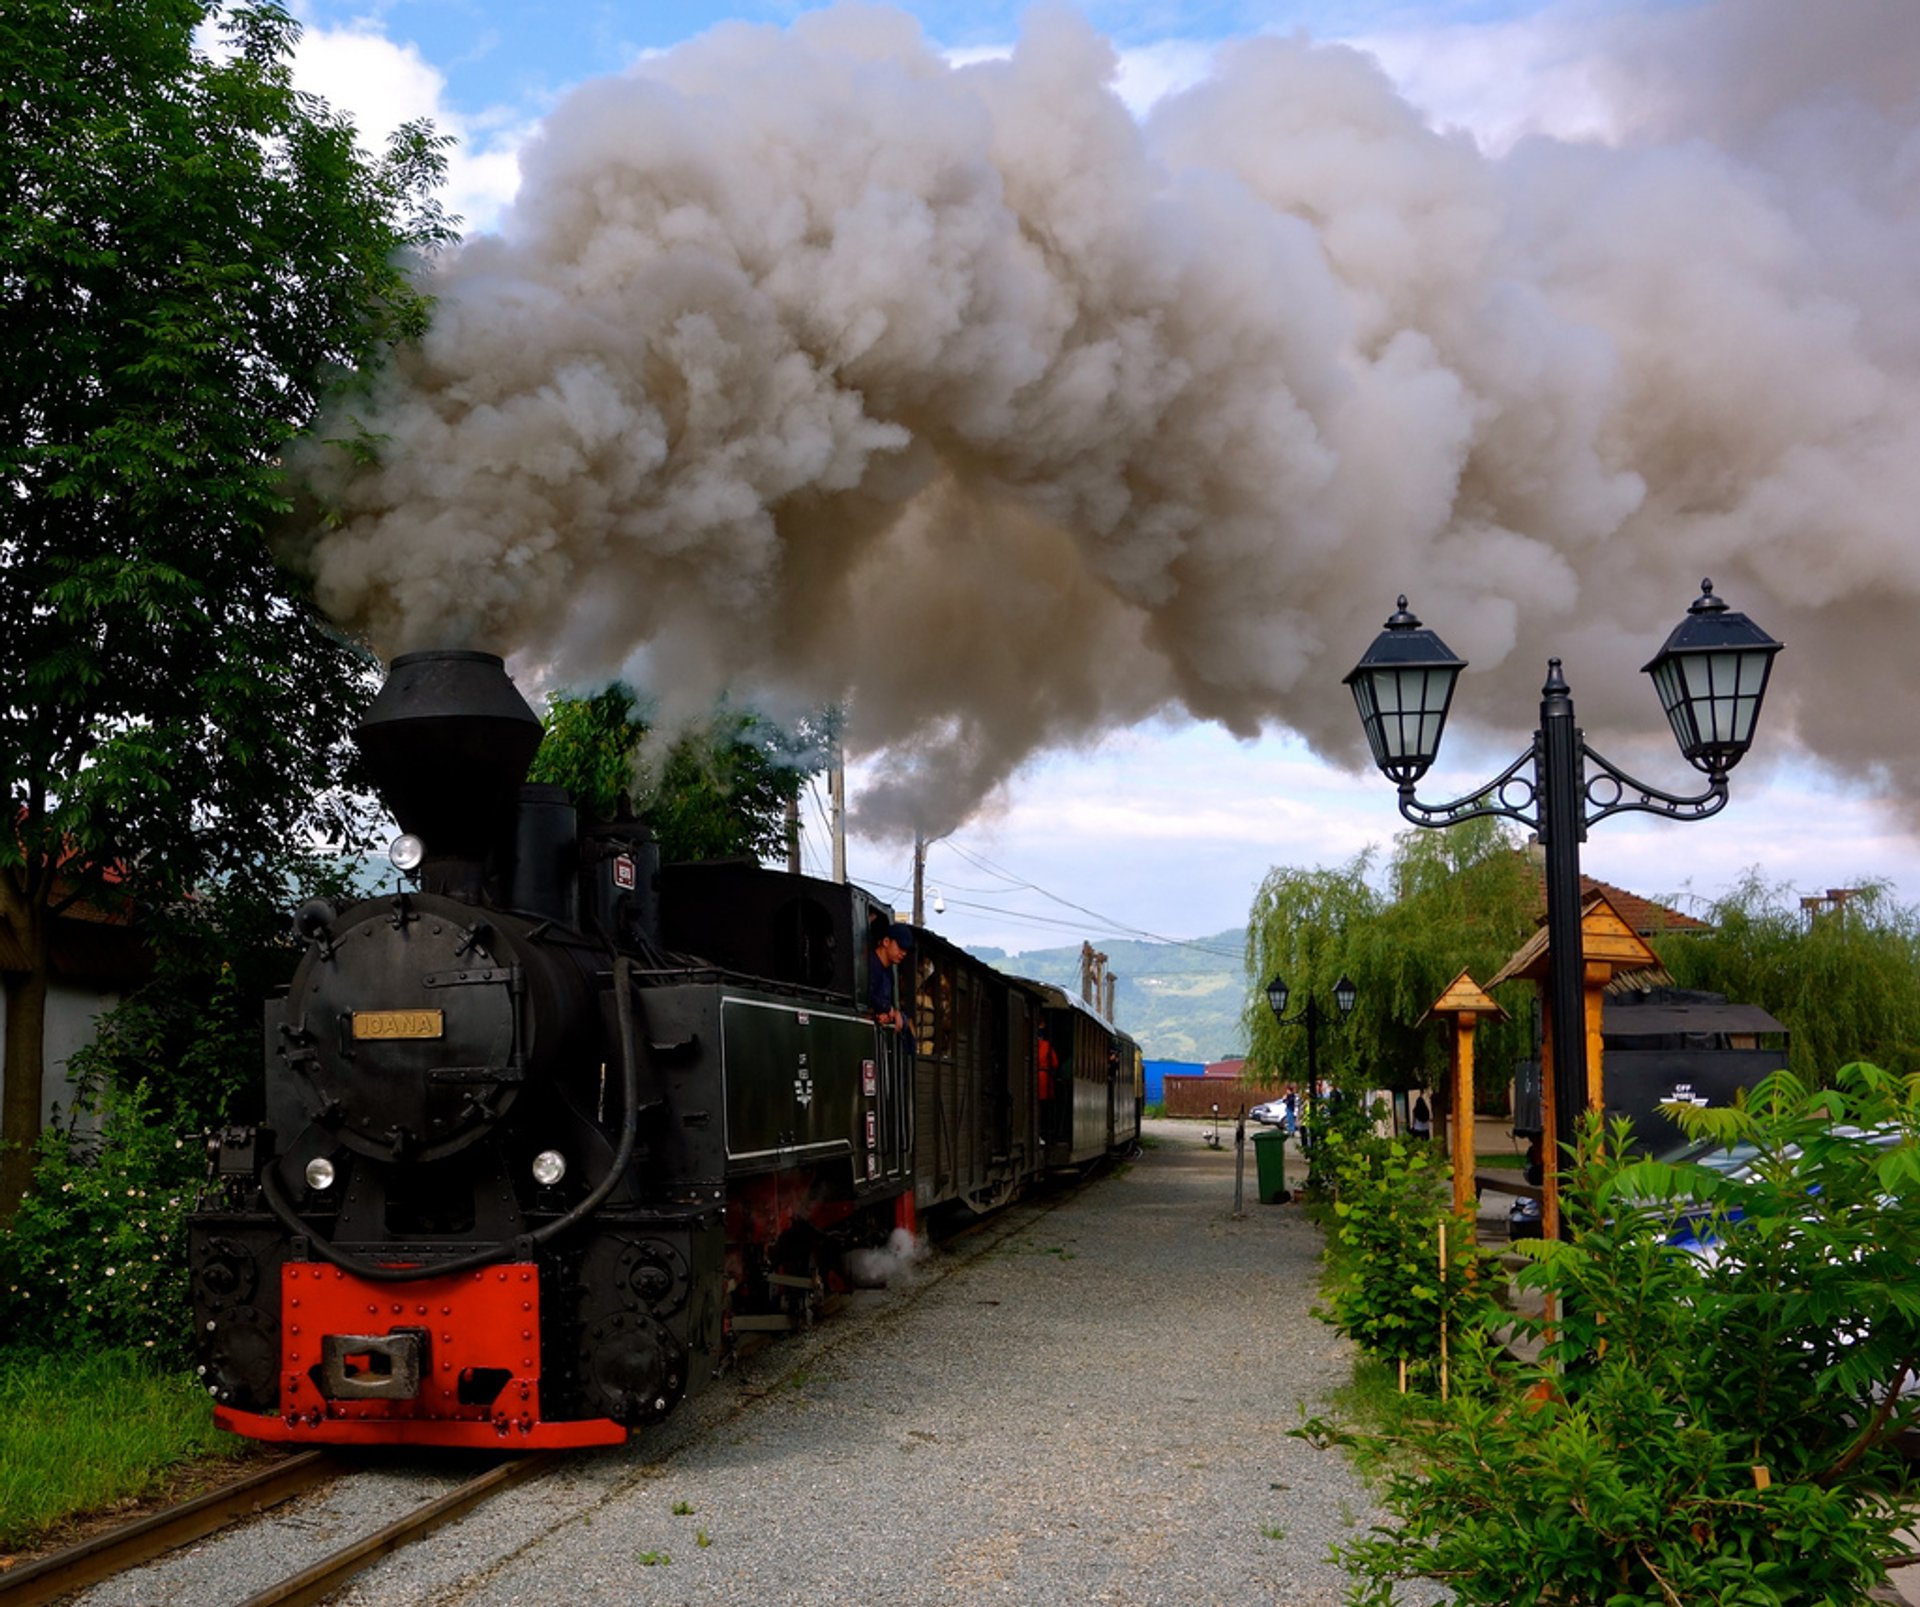 Mocăniţa Steam Train in Romania - Best Season 2020